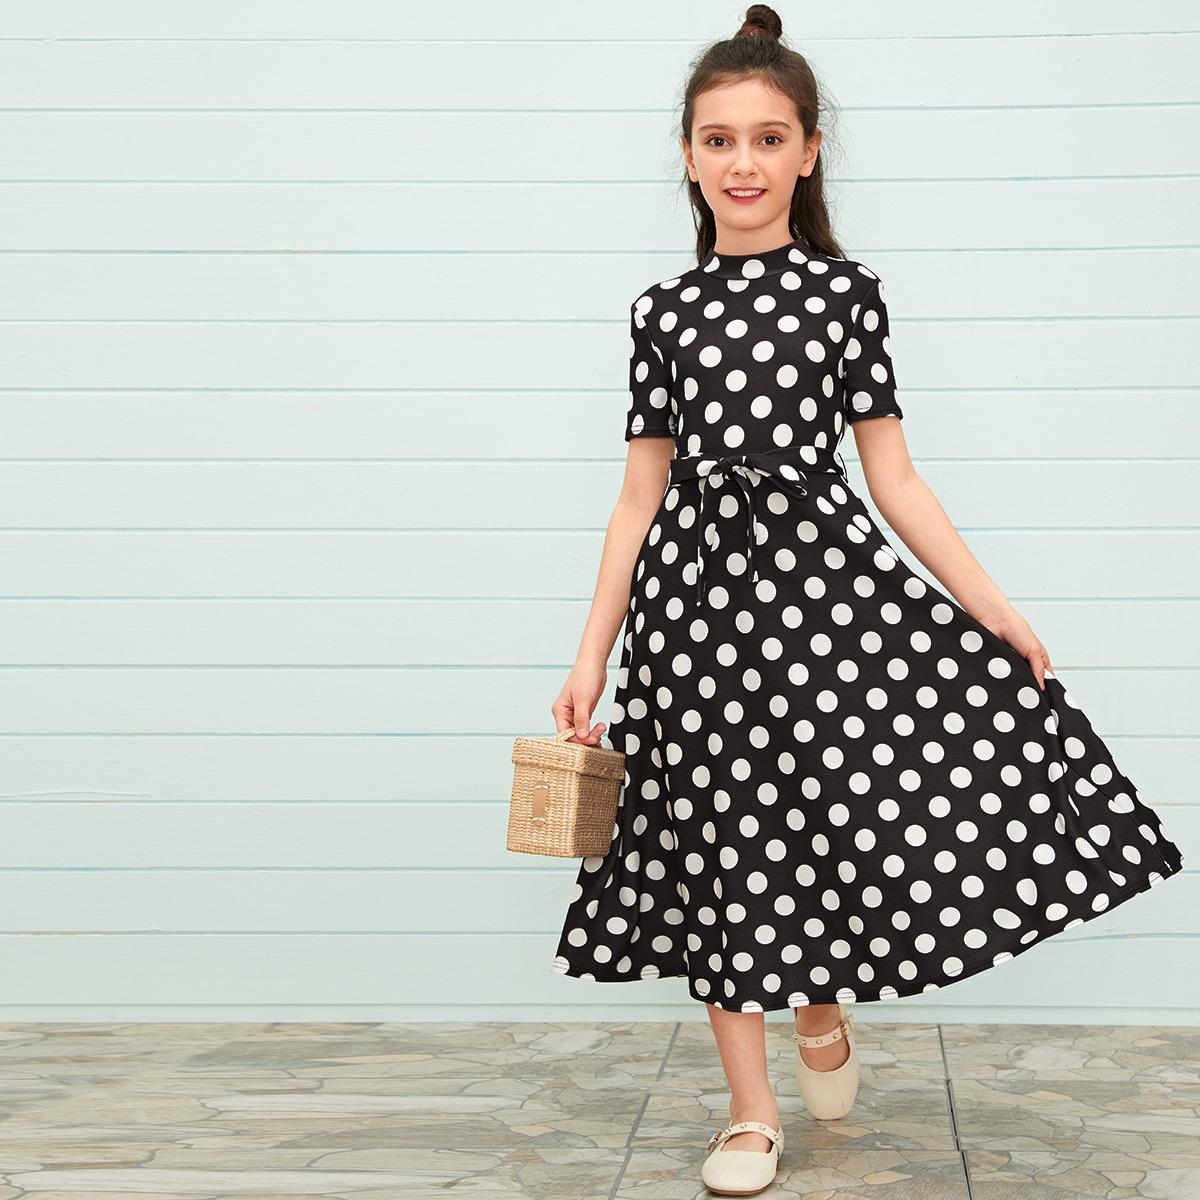 SHEIN / Girls Mock-Neck Self Belted Polka Dot Dress